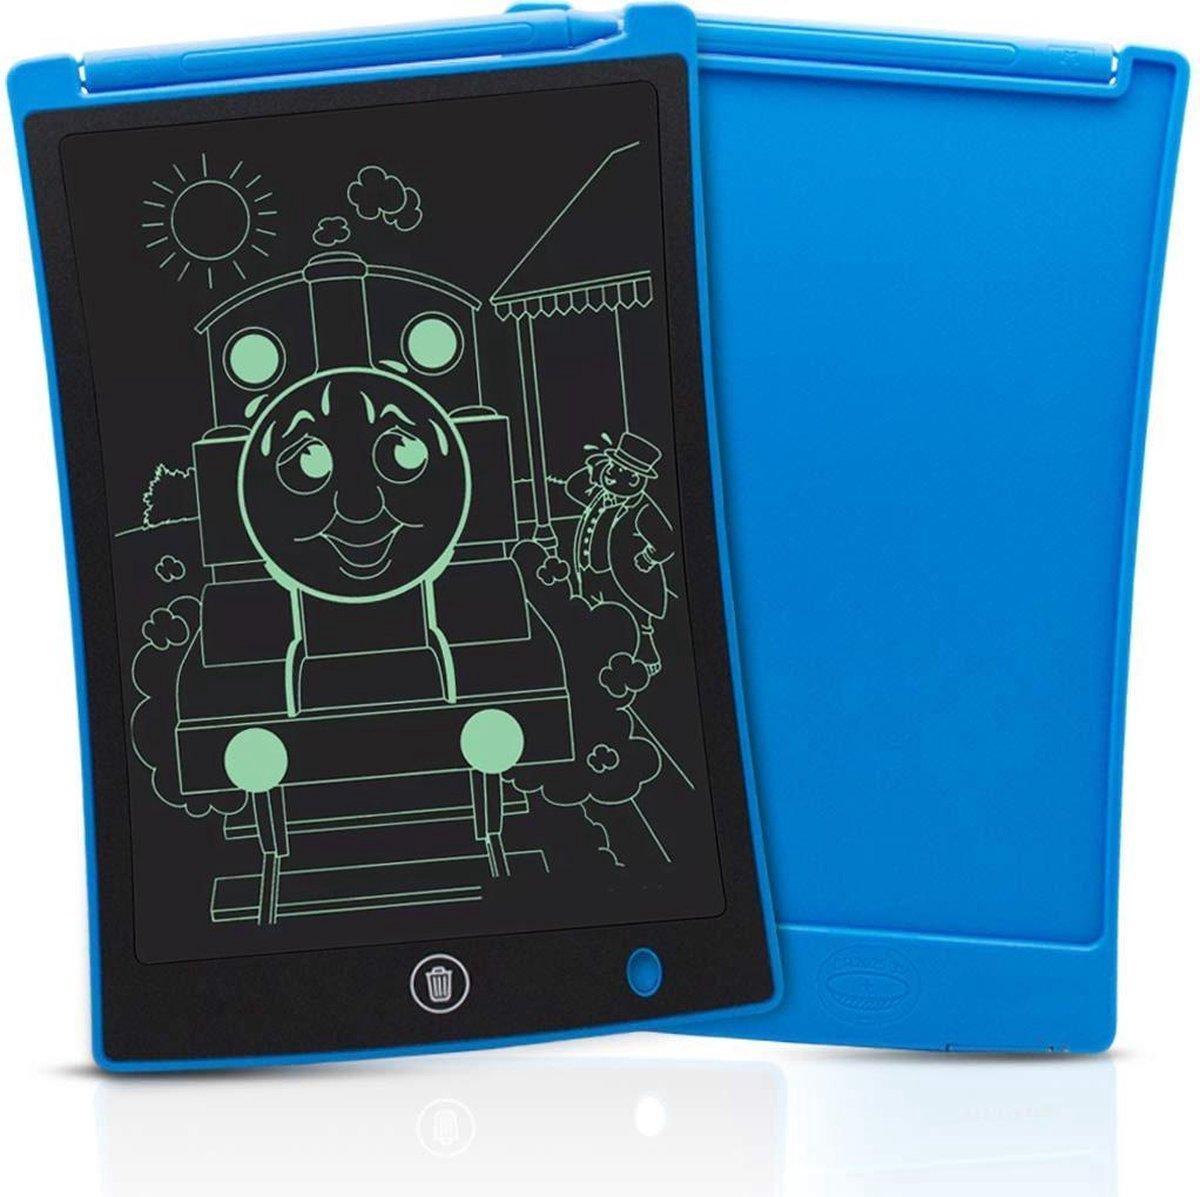 8,5 Inch Draagbare LCD-Tekenbord met Wis functie - Elektronisch Tekentablet Incl. Stylus Pen - Kinder Tablet